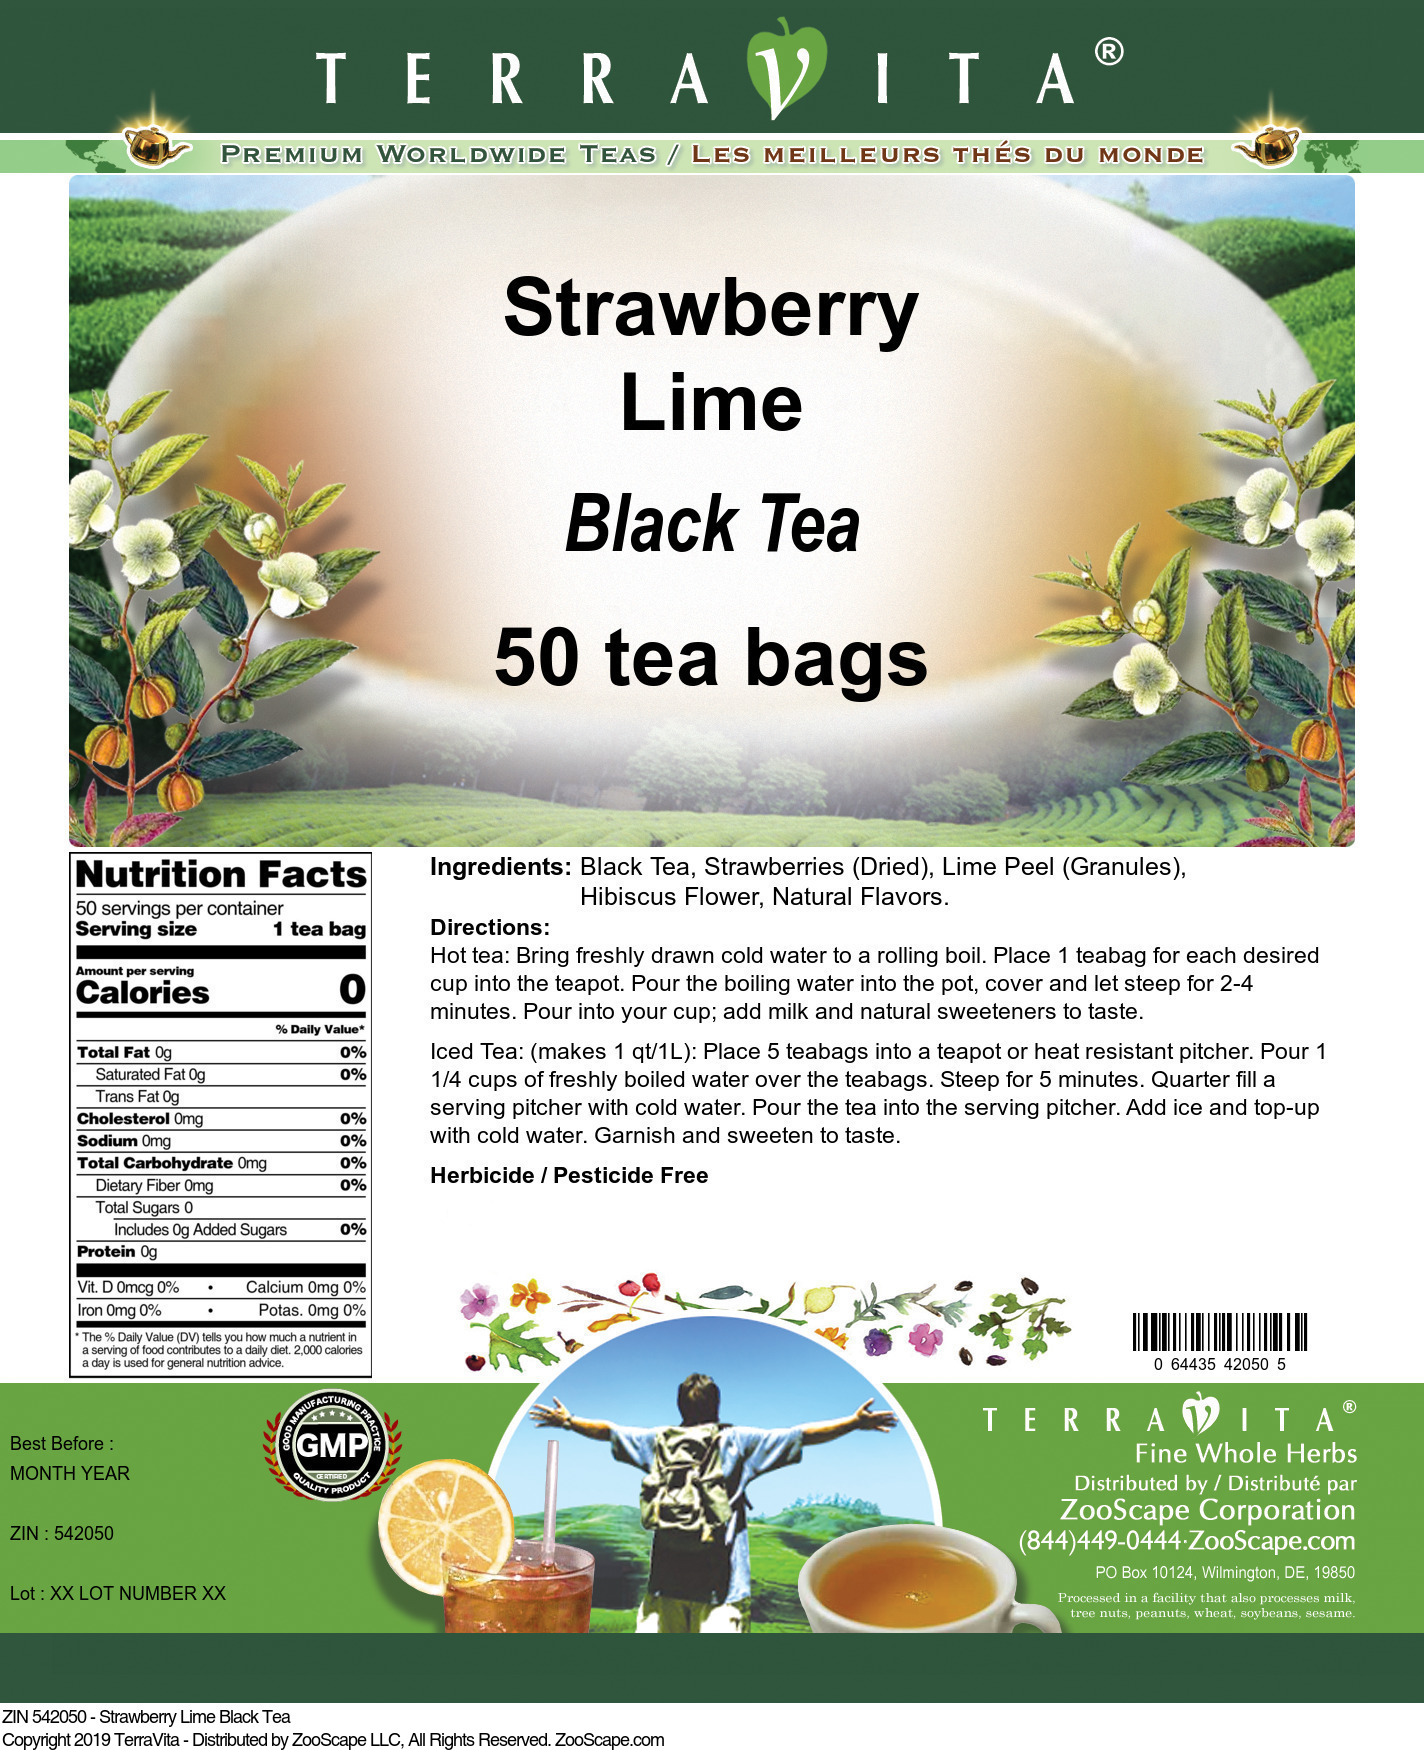 Strawberry Lime Black Tea